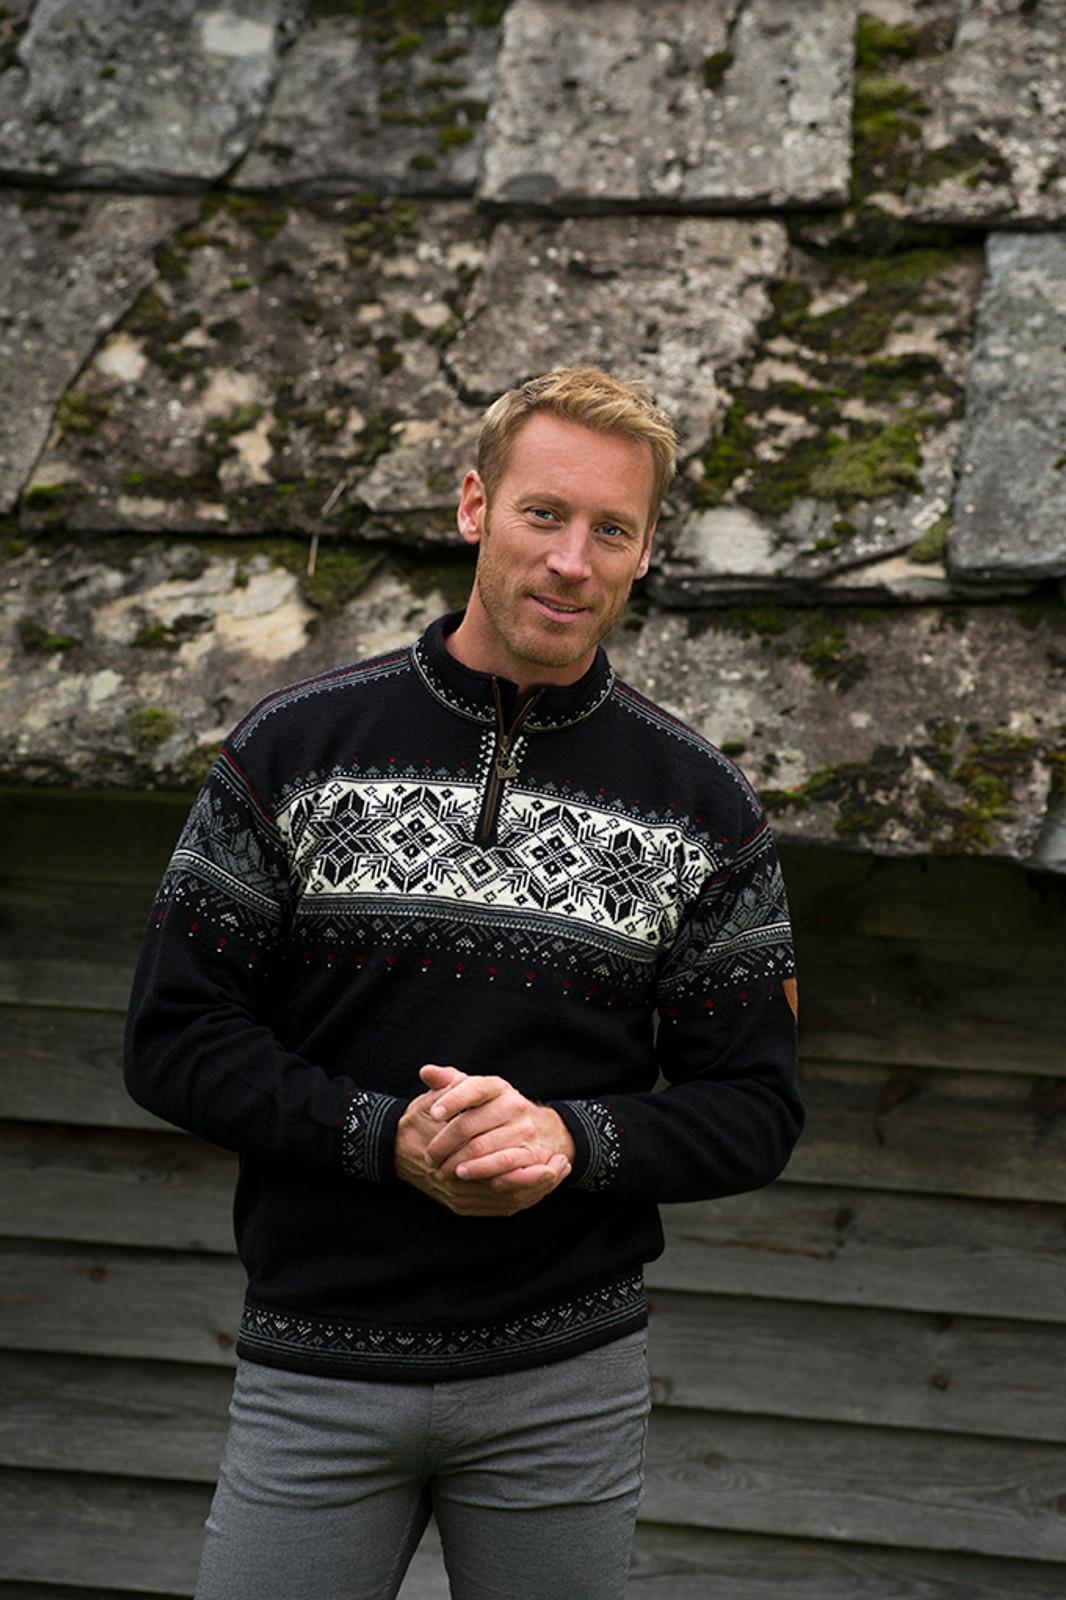 Man wearing Dale of Norway's Blyfjell Unisex Sweater in Black/Off White/Smoke/Raspberry, 91291-F